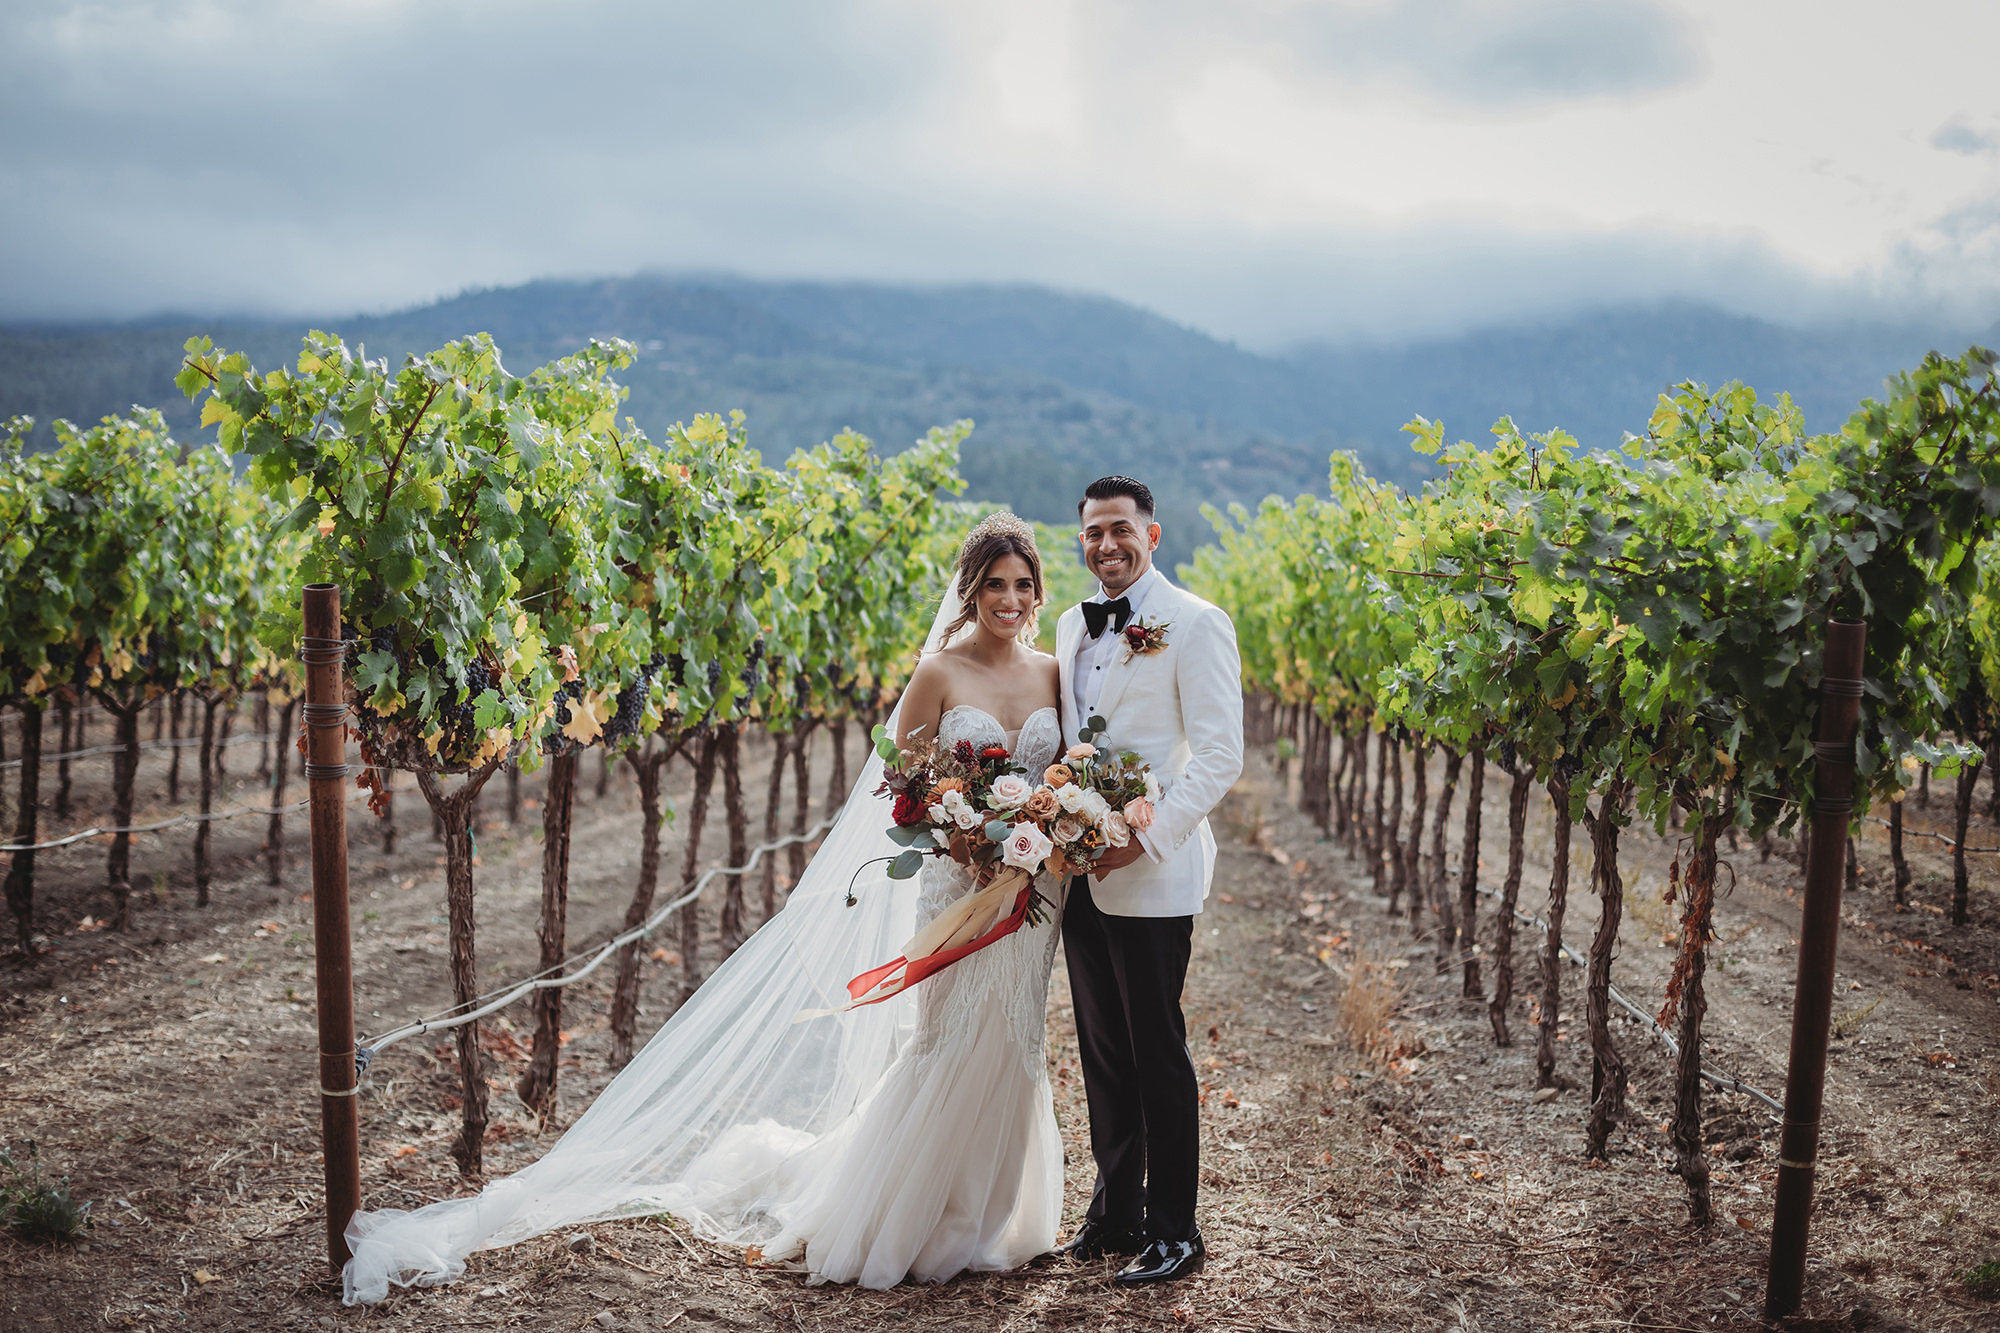 Bride and groom in the vineyard at Harvest Inn in St Helena.